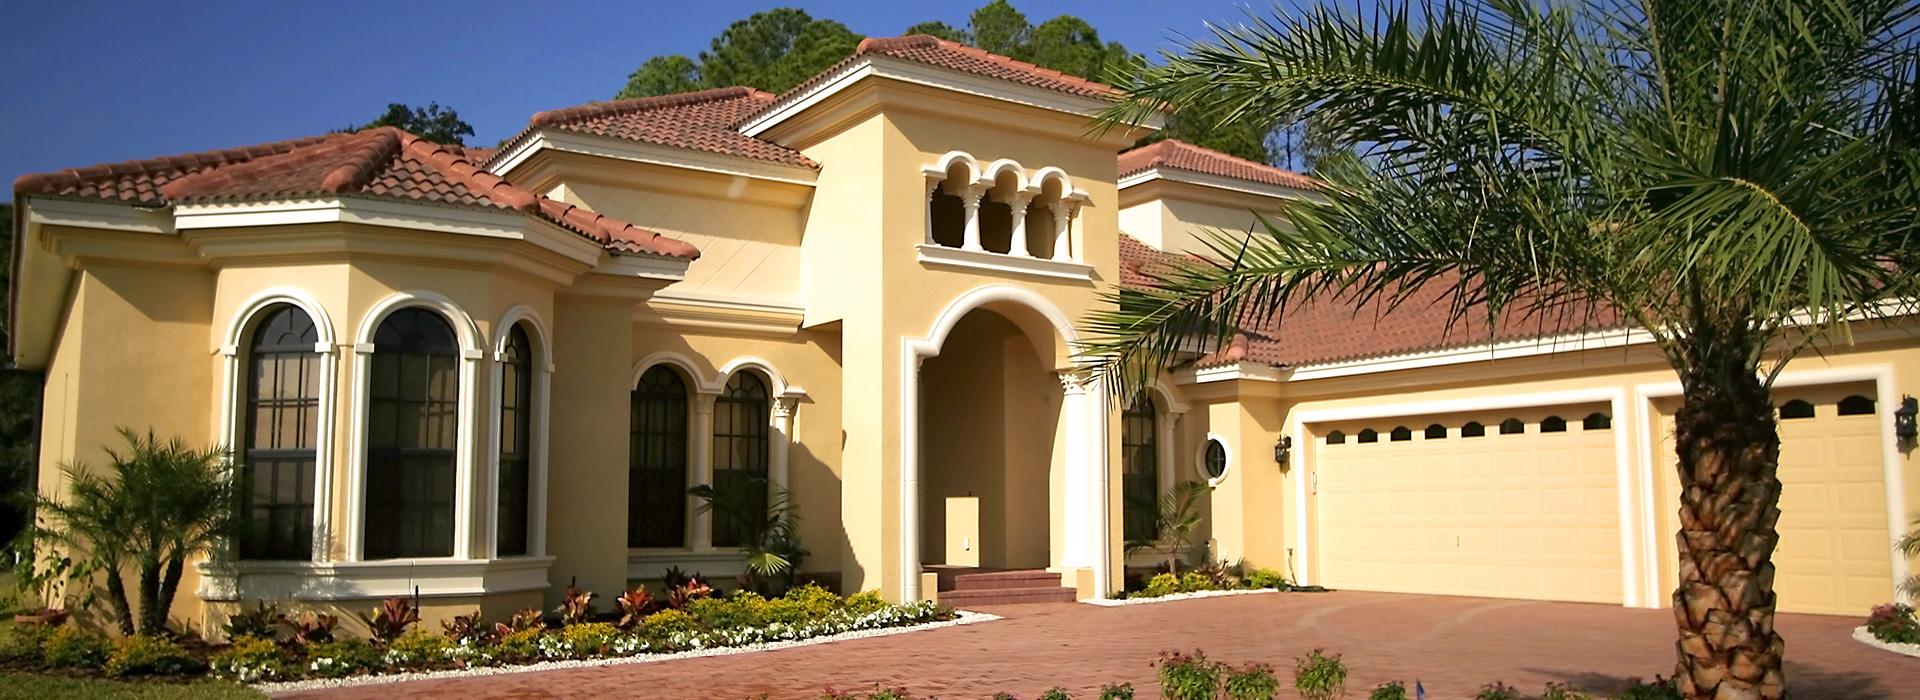 John Galt Homeowners Insurance Quote